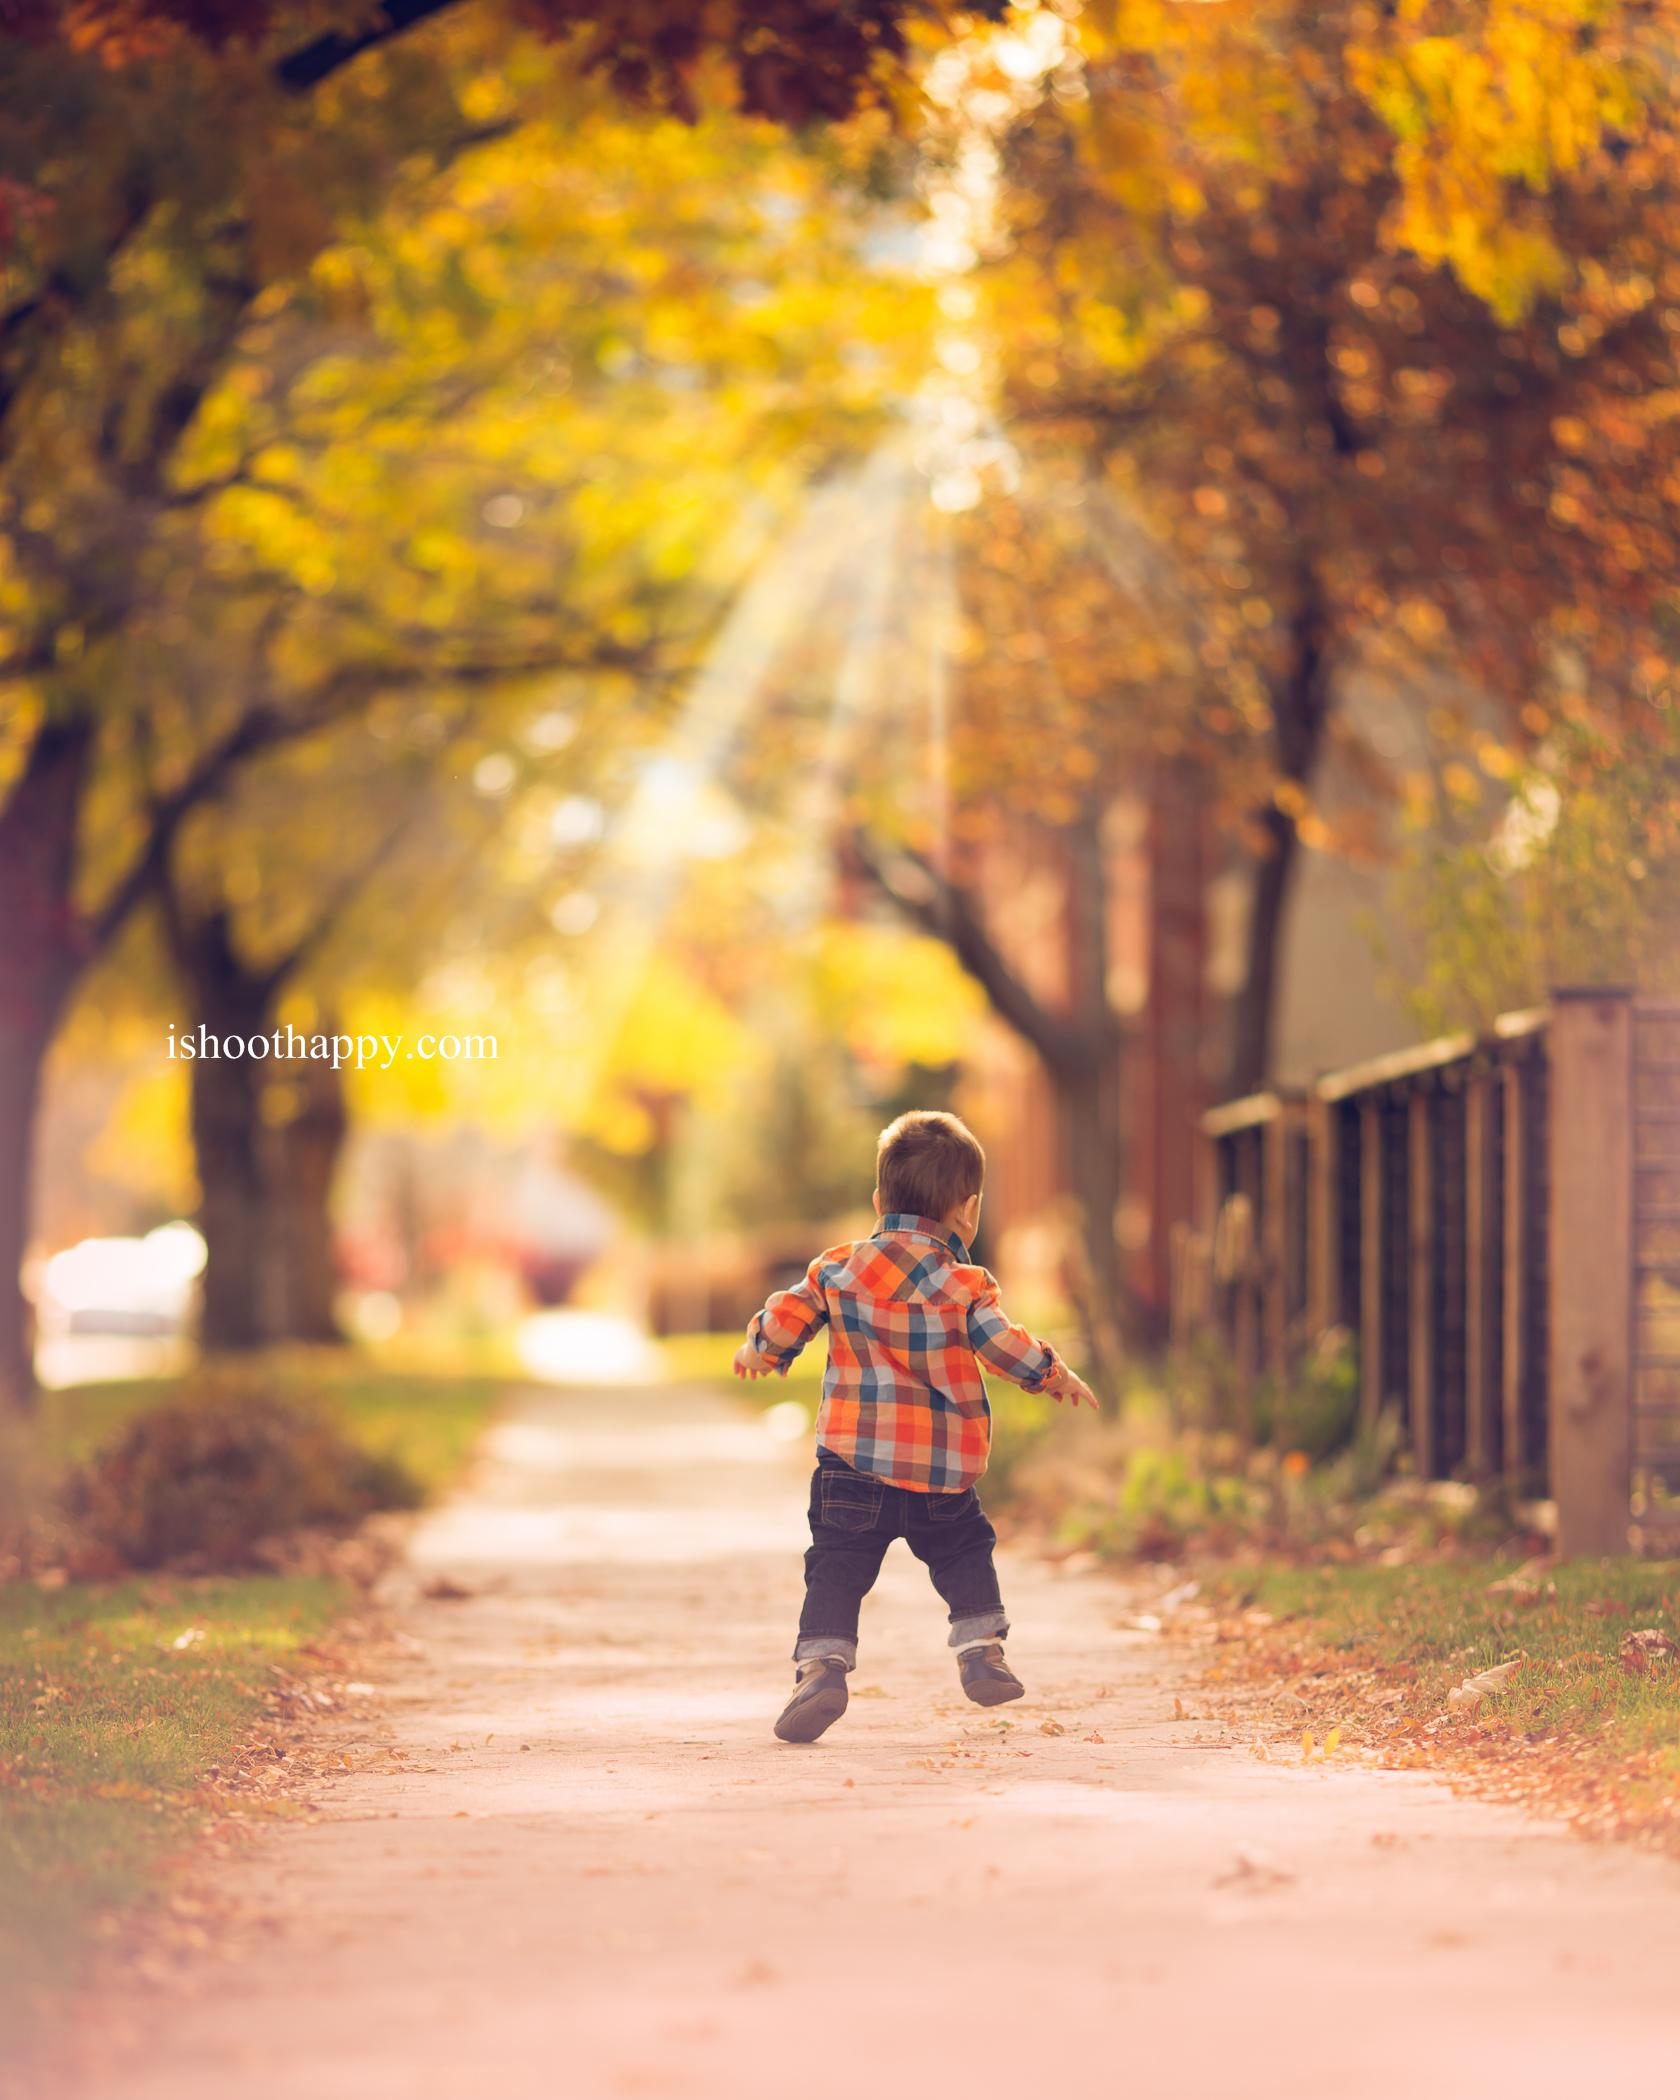 Denver Children Photography, Denver Child Photography, Children Photo, Baby Photographer Denver, Child Photo Session, Denver Newborn Photography, Newborn Baby Photo Session, Denver Newborn photographer